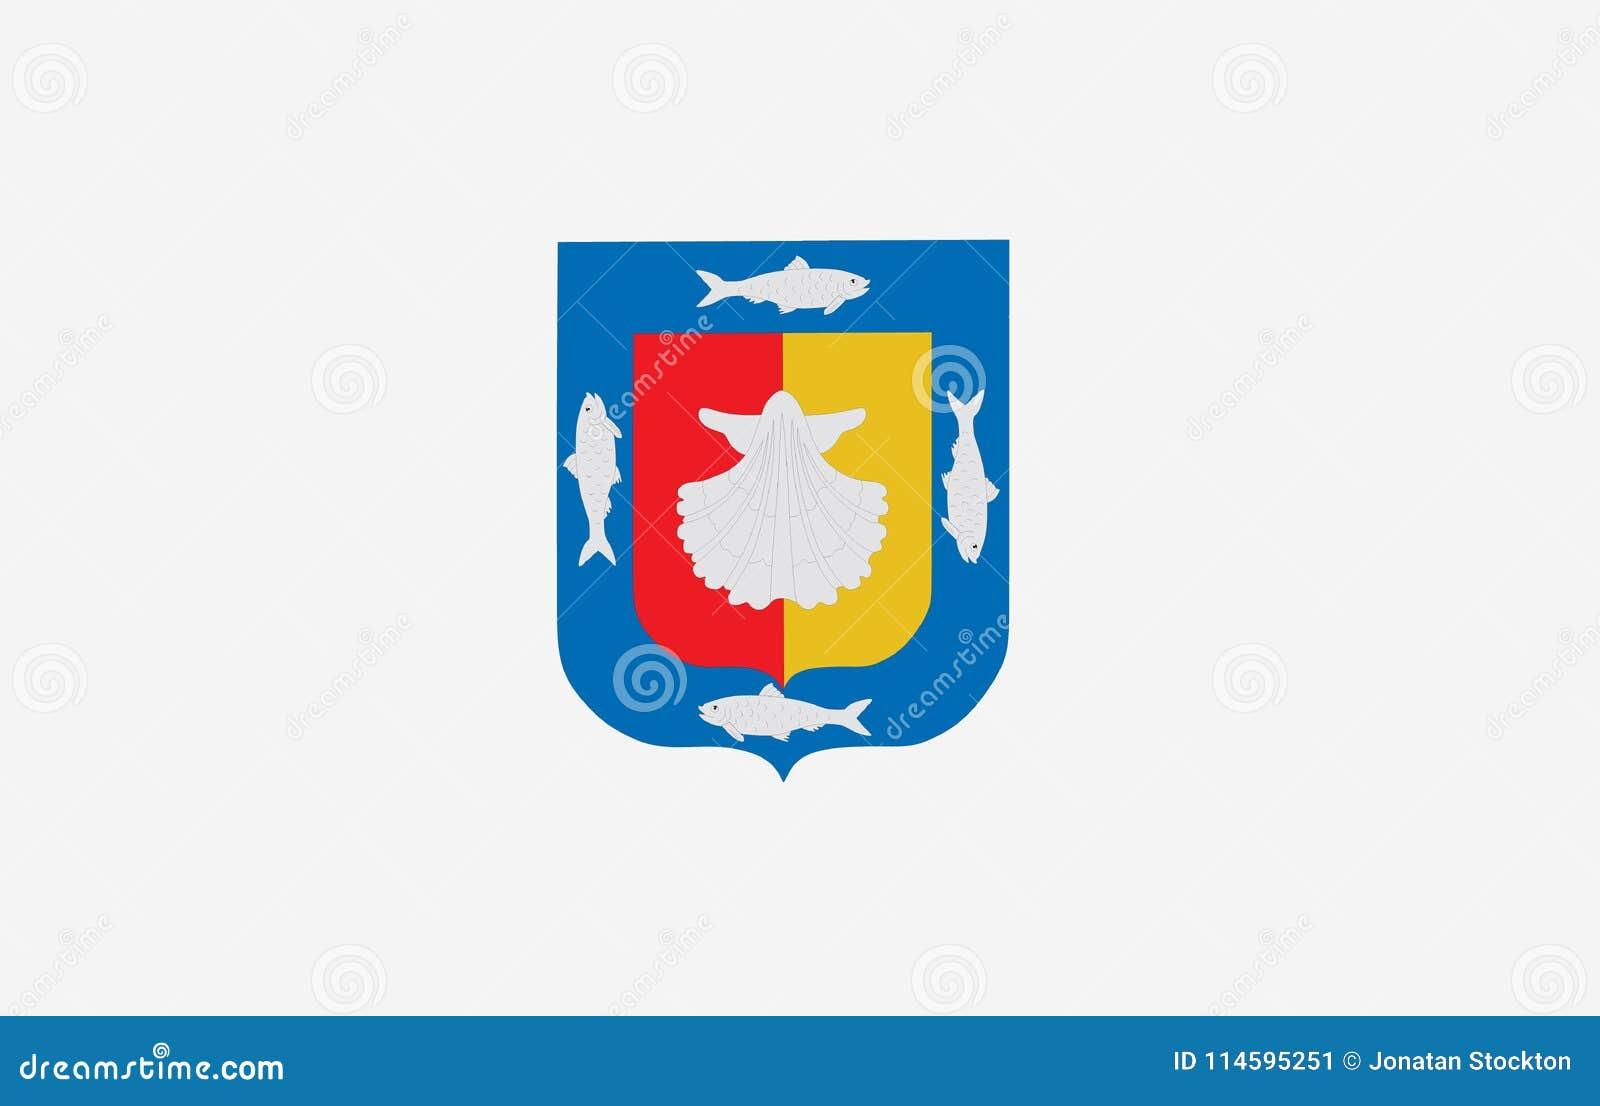 Baja California Sur Flag